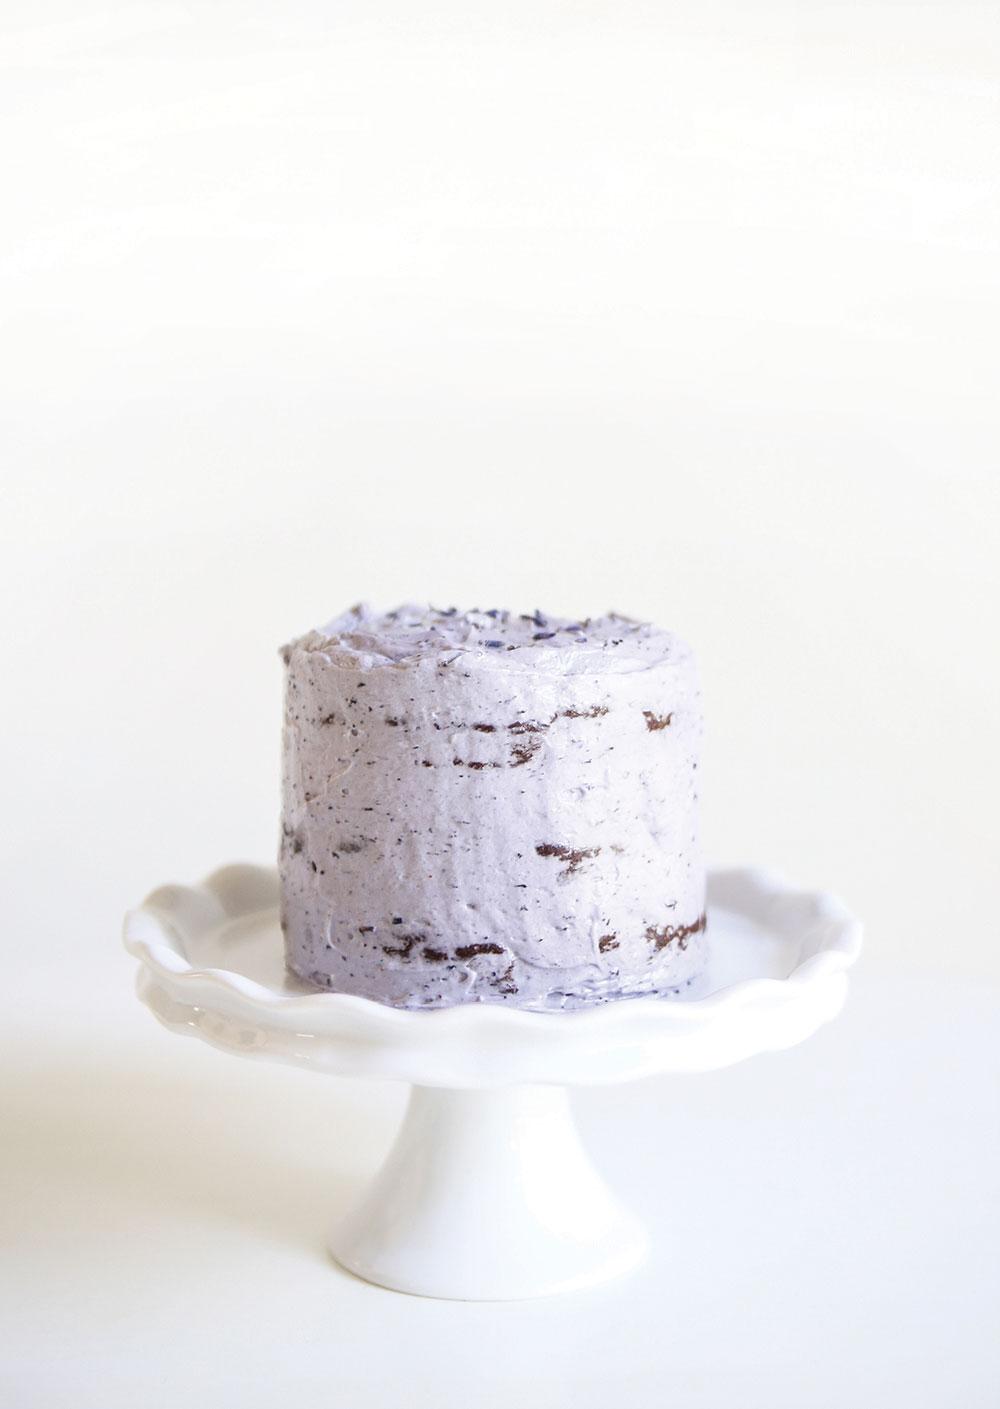 Gluten-Free-Vegan-Chocolate-Lavender-Cake7